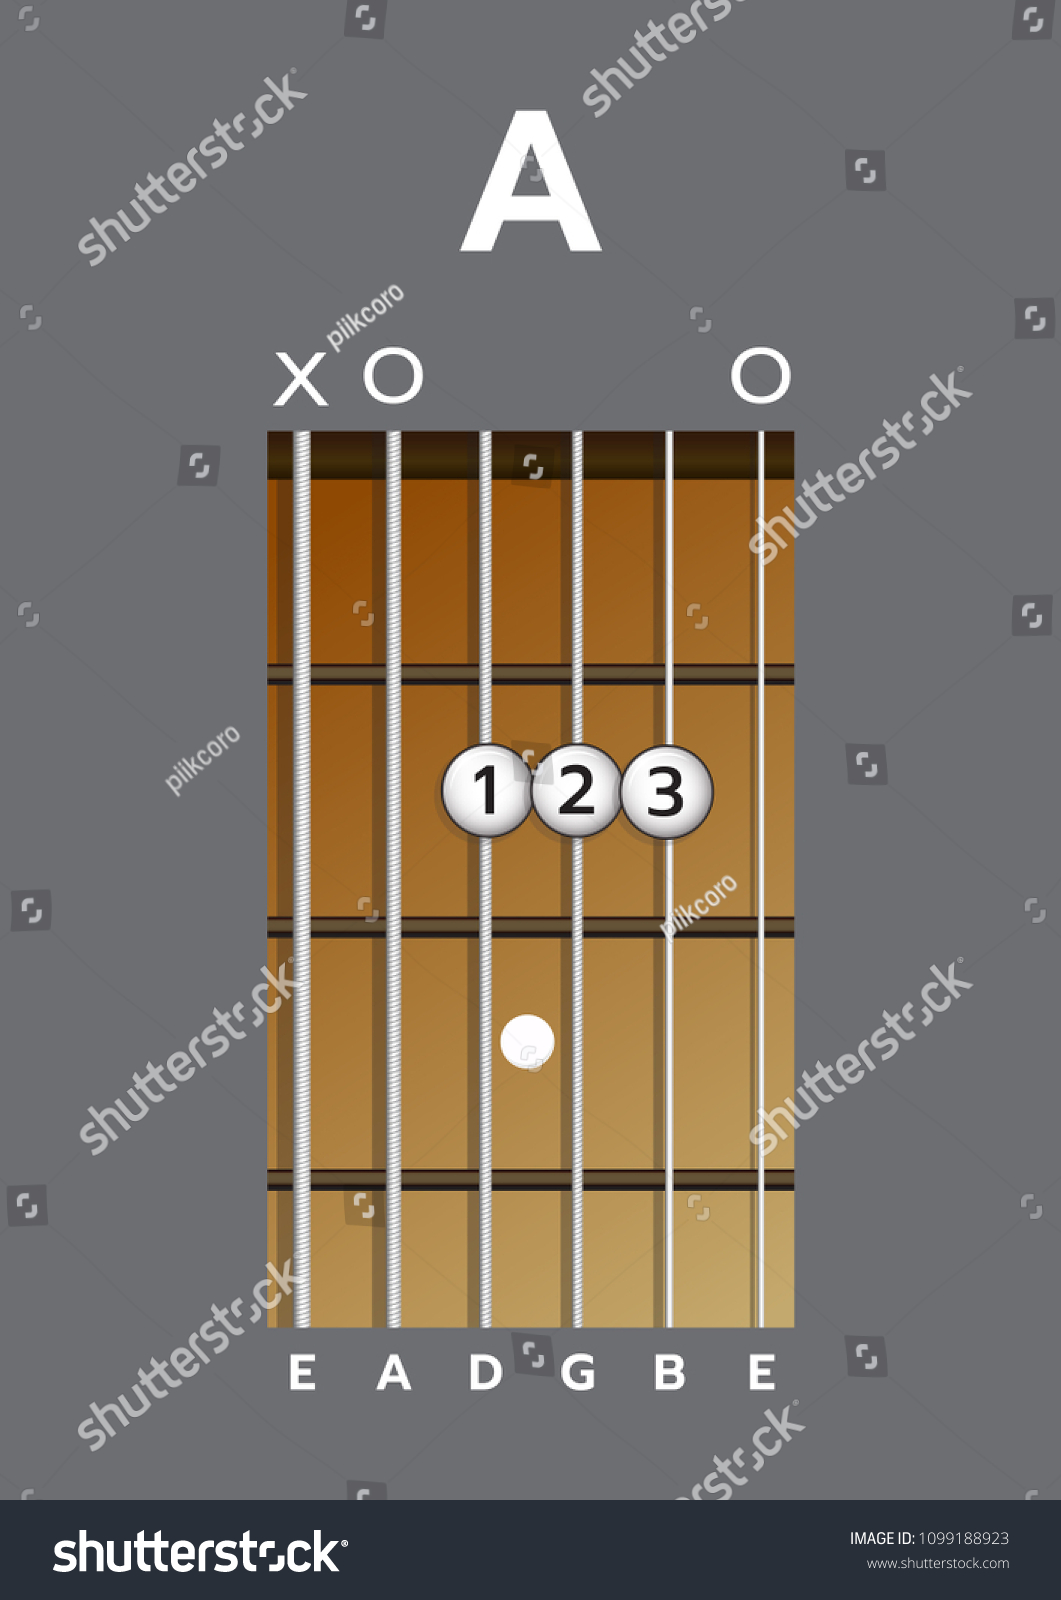 Chord Diagram Tab Tabulation Finger Chart Stock Vector Royalty Free Guitar Chords Fingers Charts Basic A